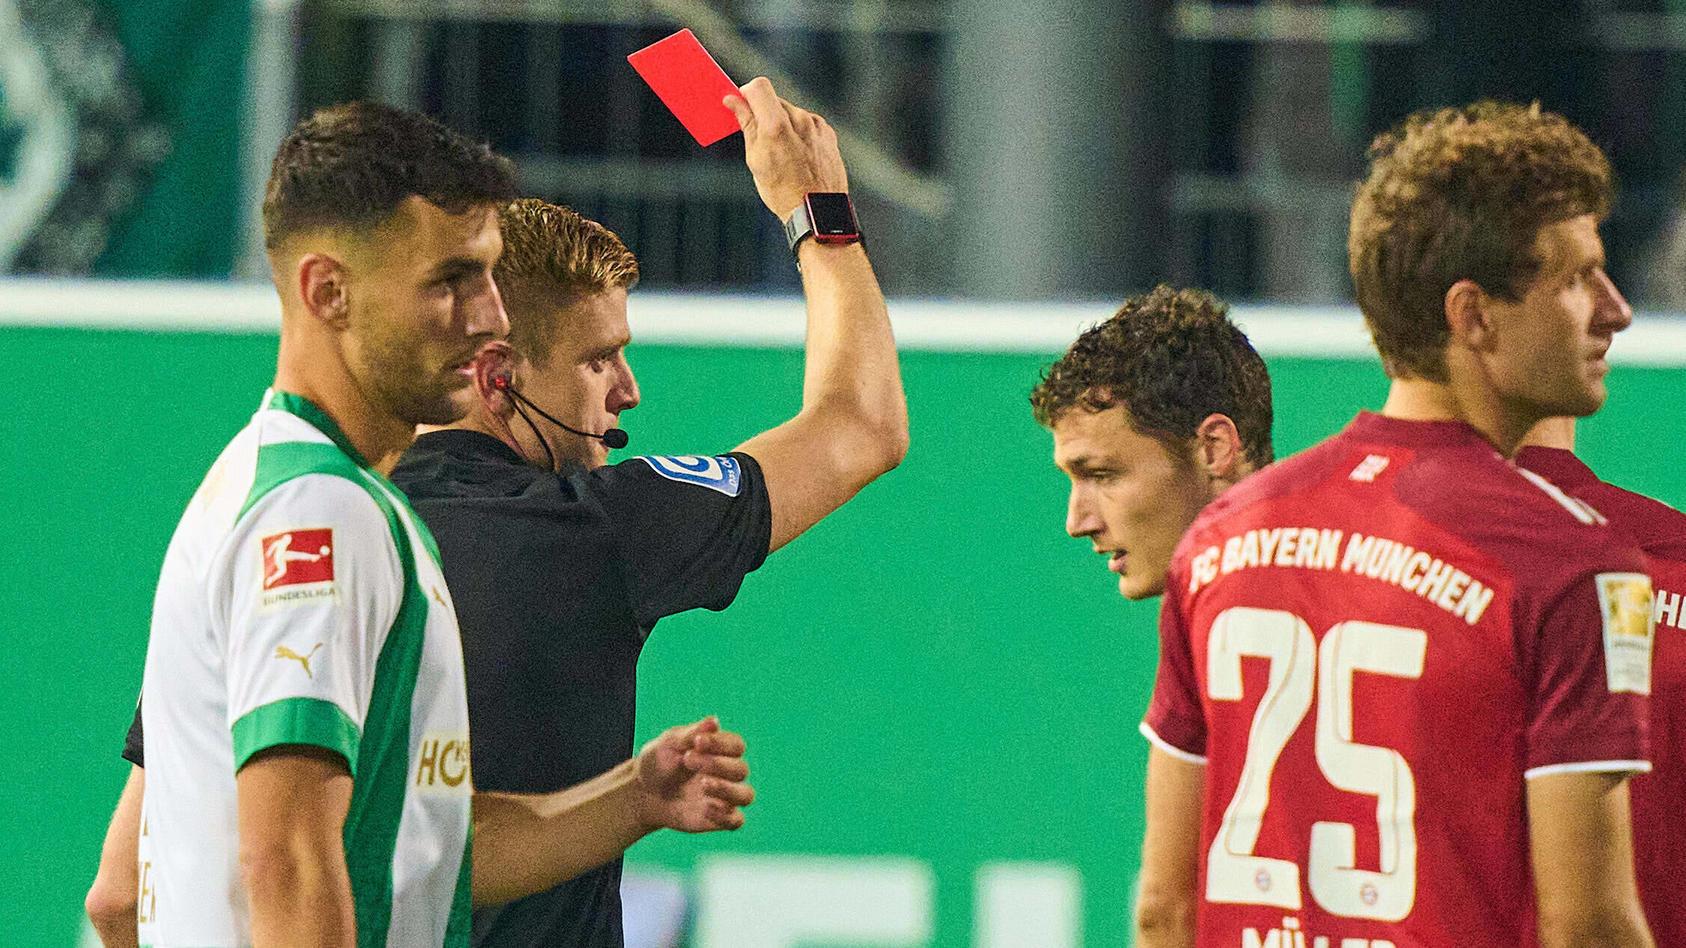 24.09.2021, Fussball, Bundesliga 2021 - 2022, 6. Spieltag, SpVgg Greuther Fuerth - FC Bayern Muenchen, GER, Fuerth, Spo